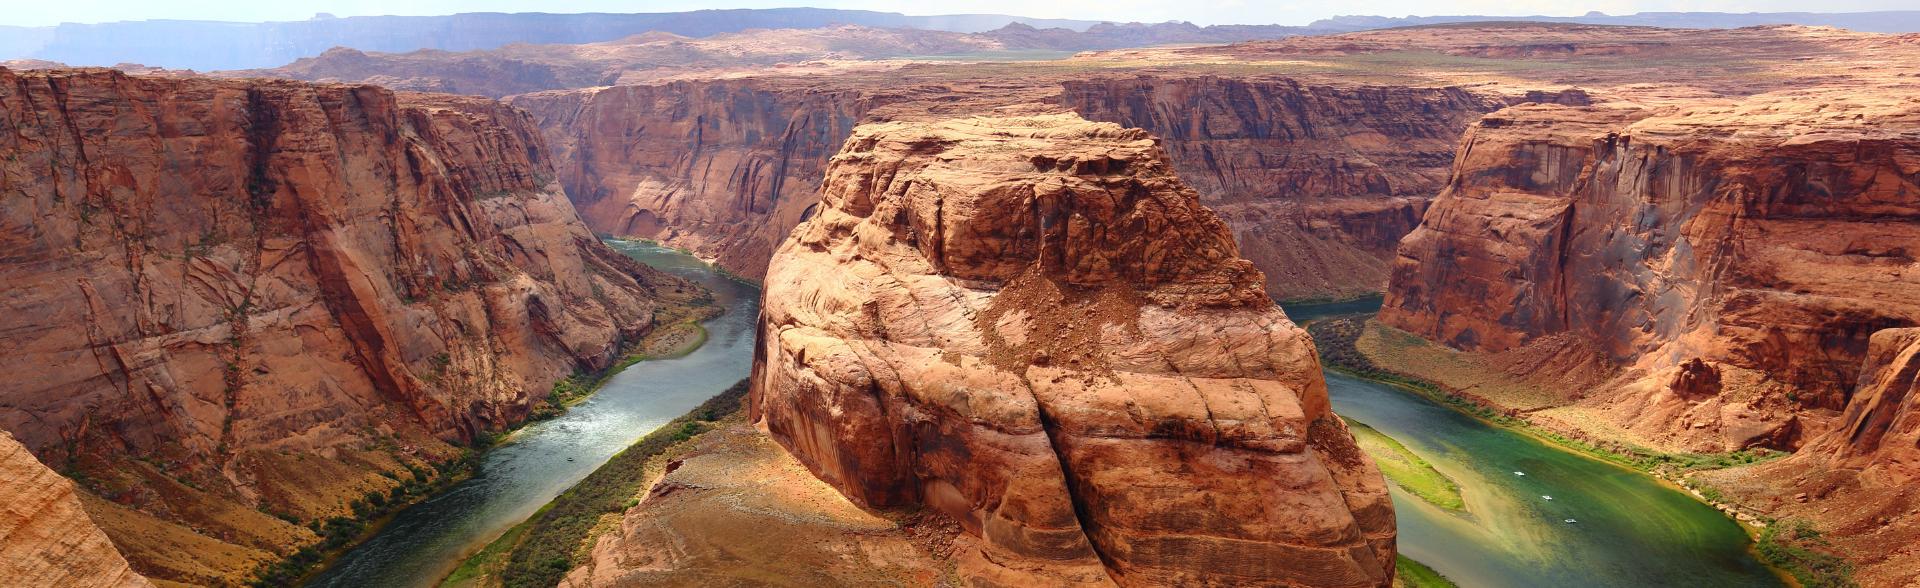 Grand Canyon 1920x588